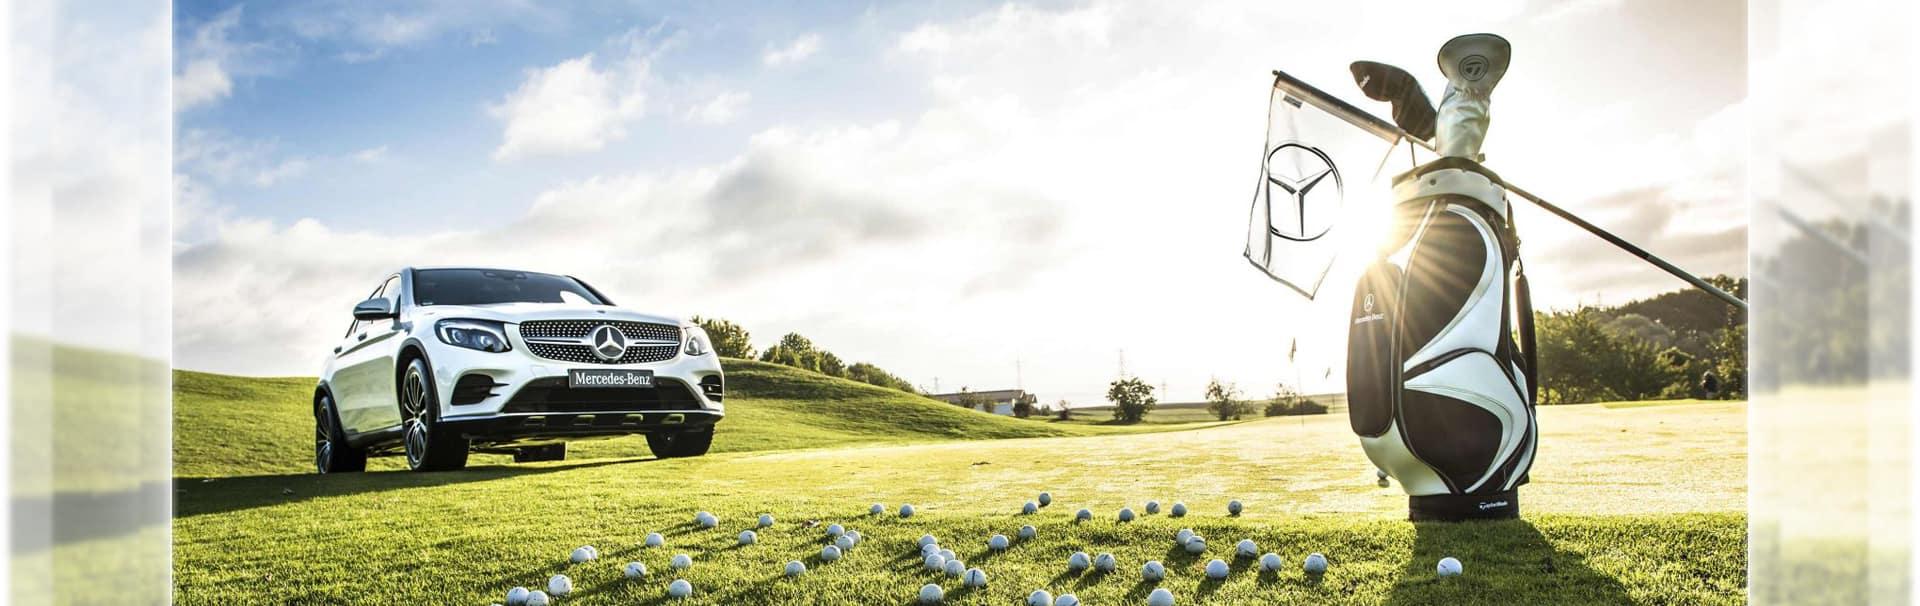 Mercedes-Benz Golf Events